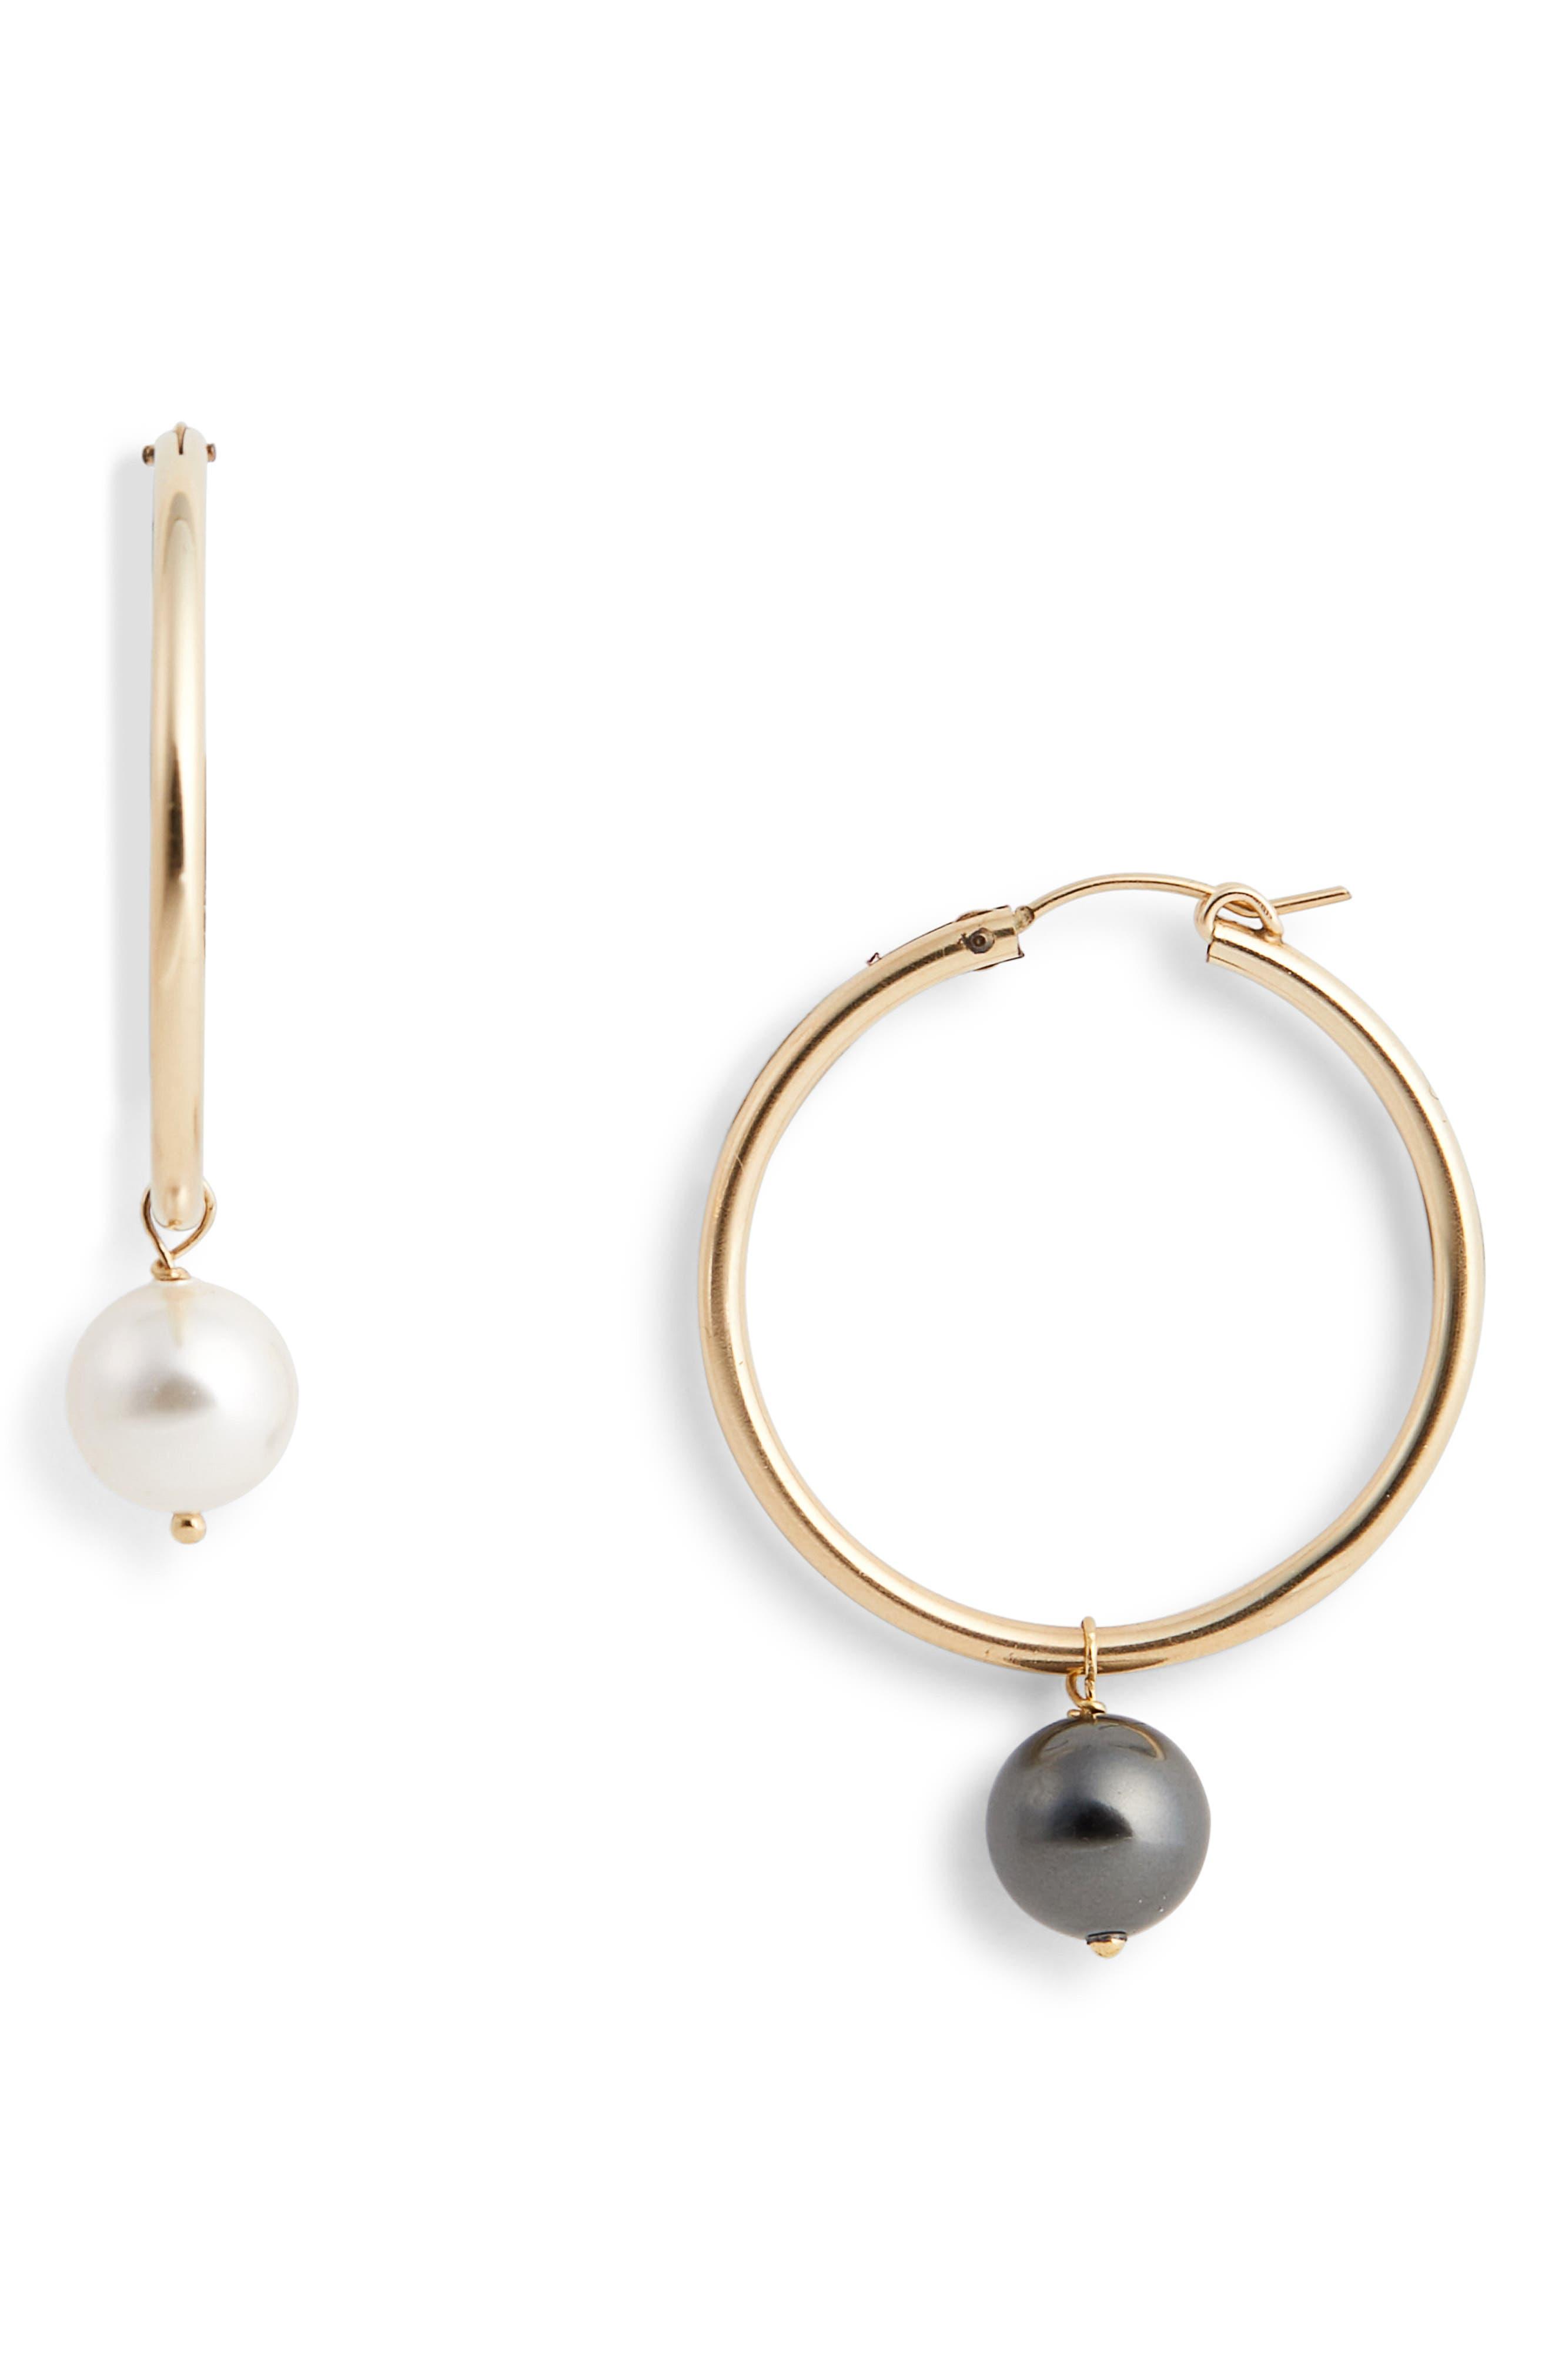 Agra Mismatched Swarovski Imitation Pearl Hoop Earrings,                         Main,                         color, WHITE PEARL BLACK PEARL